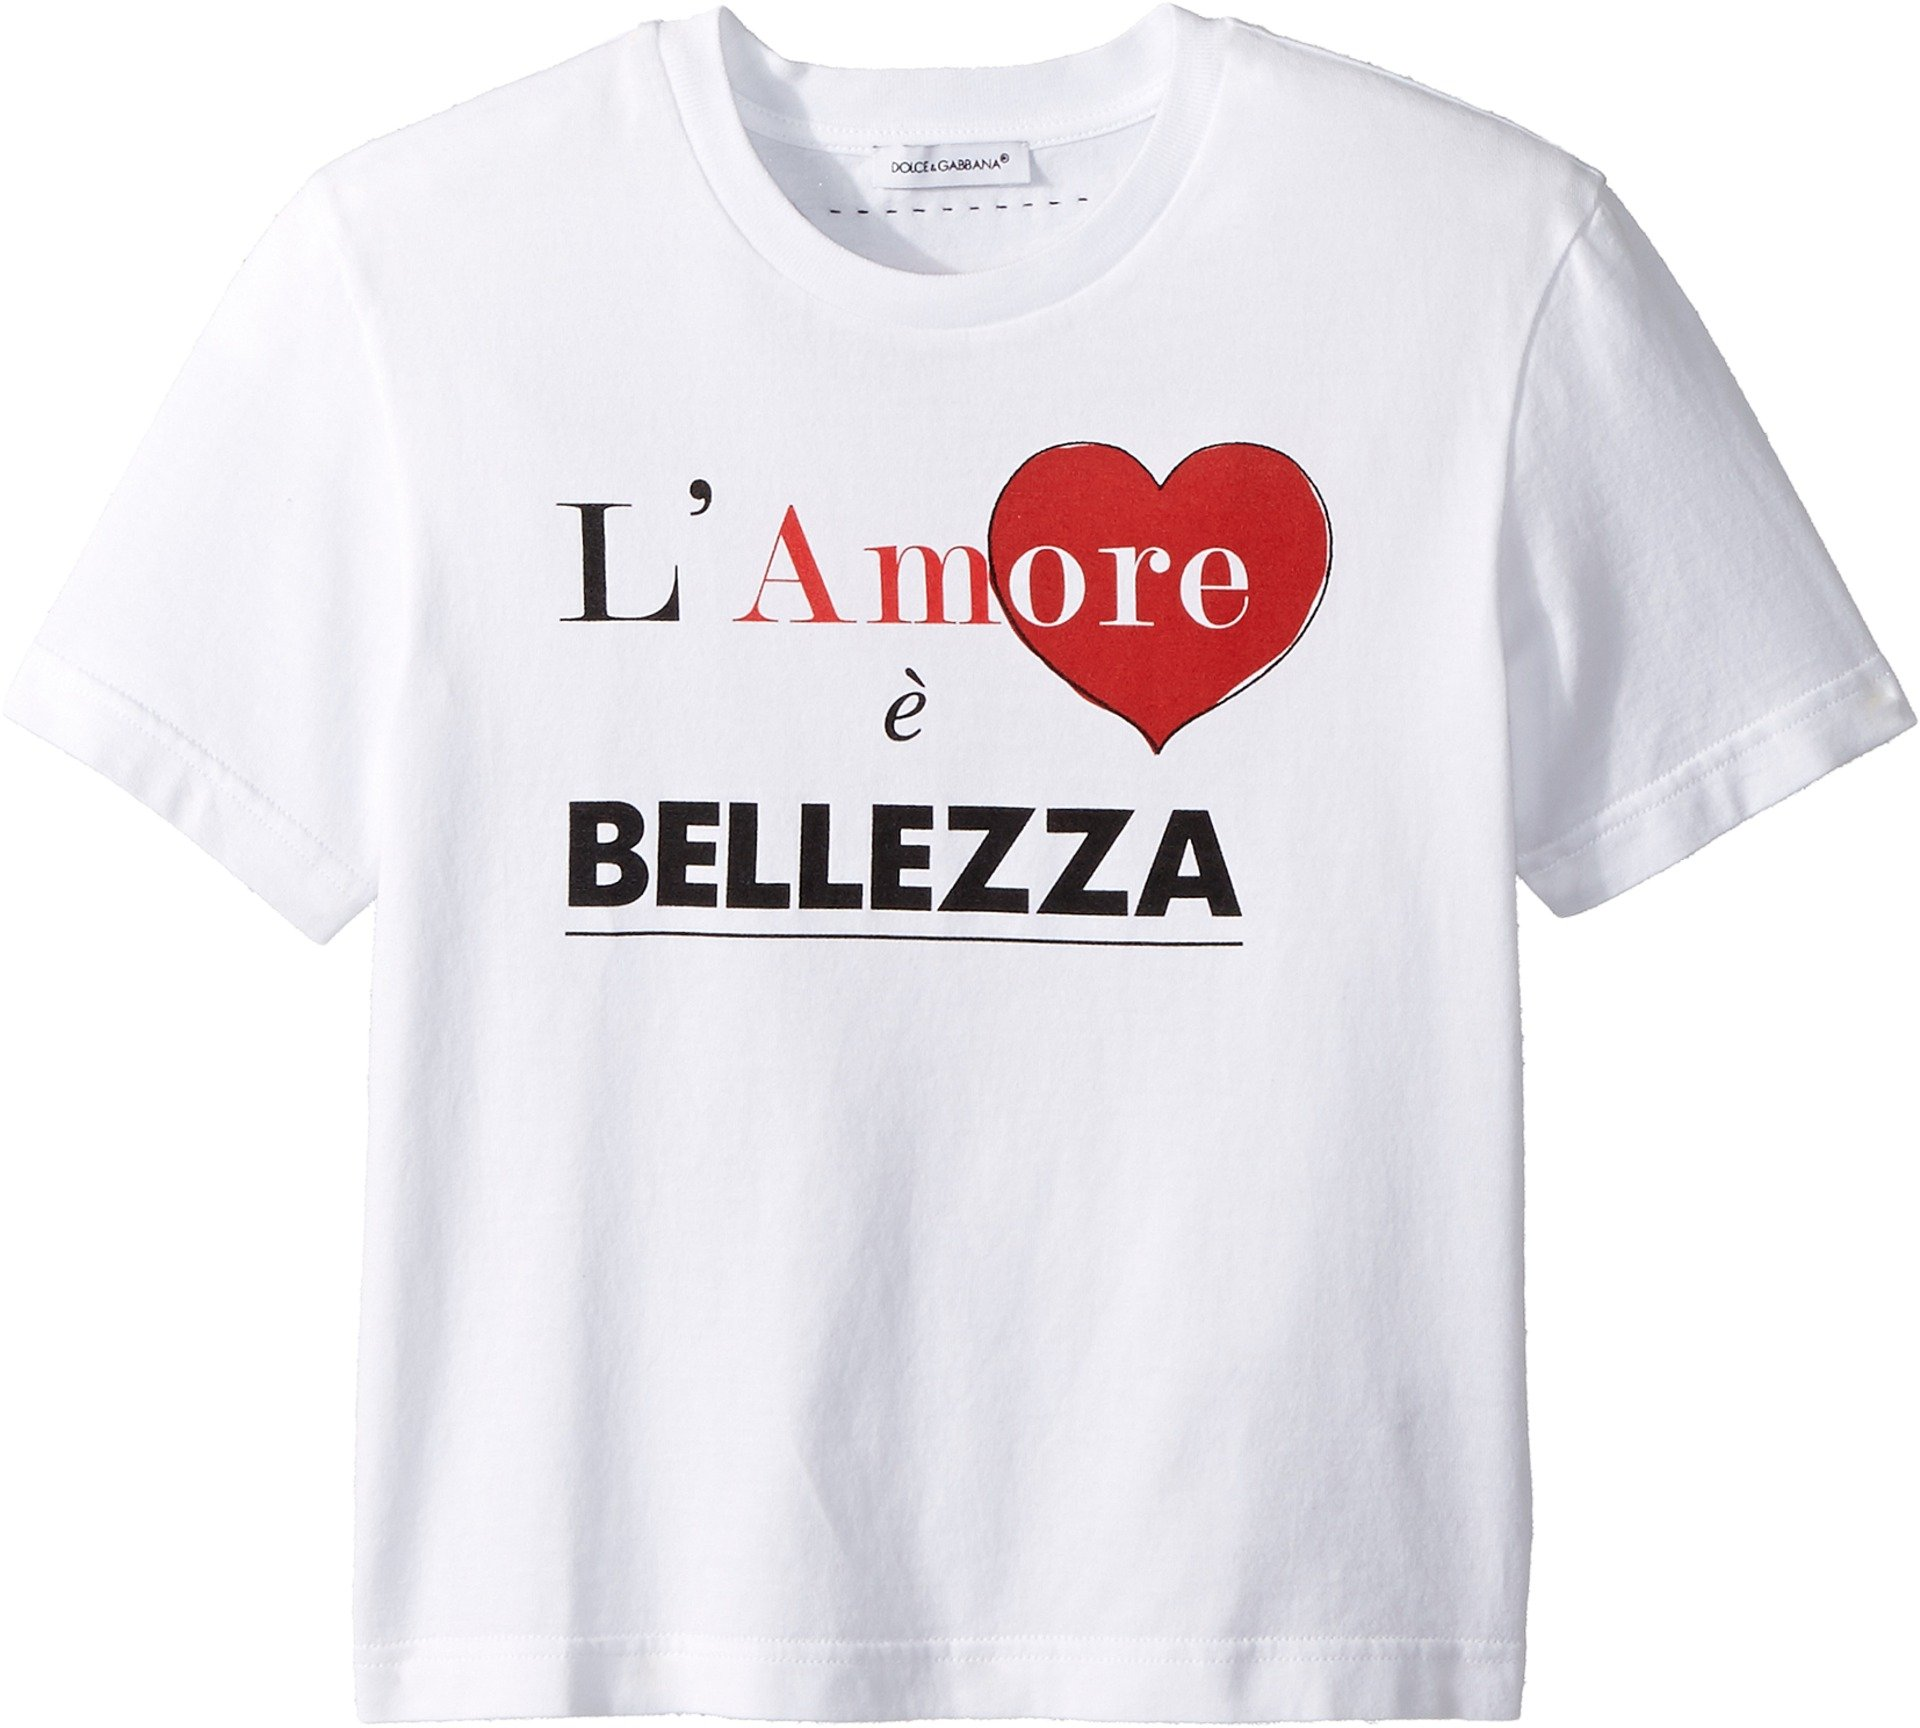 Dolce & Gabbana Kids Baby Girl's Love & Bellezza T-Shirt (Toddler/Little Kids) White 2T (Toddler) by Dolce & Gabbana (Image #1)